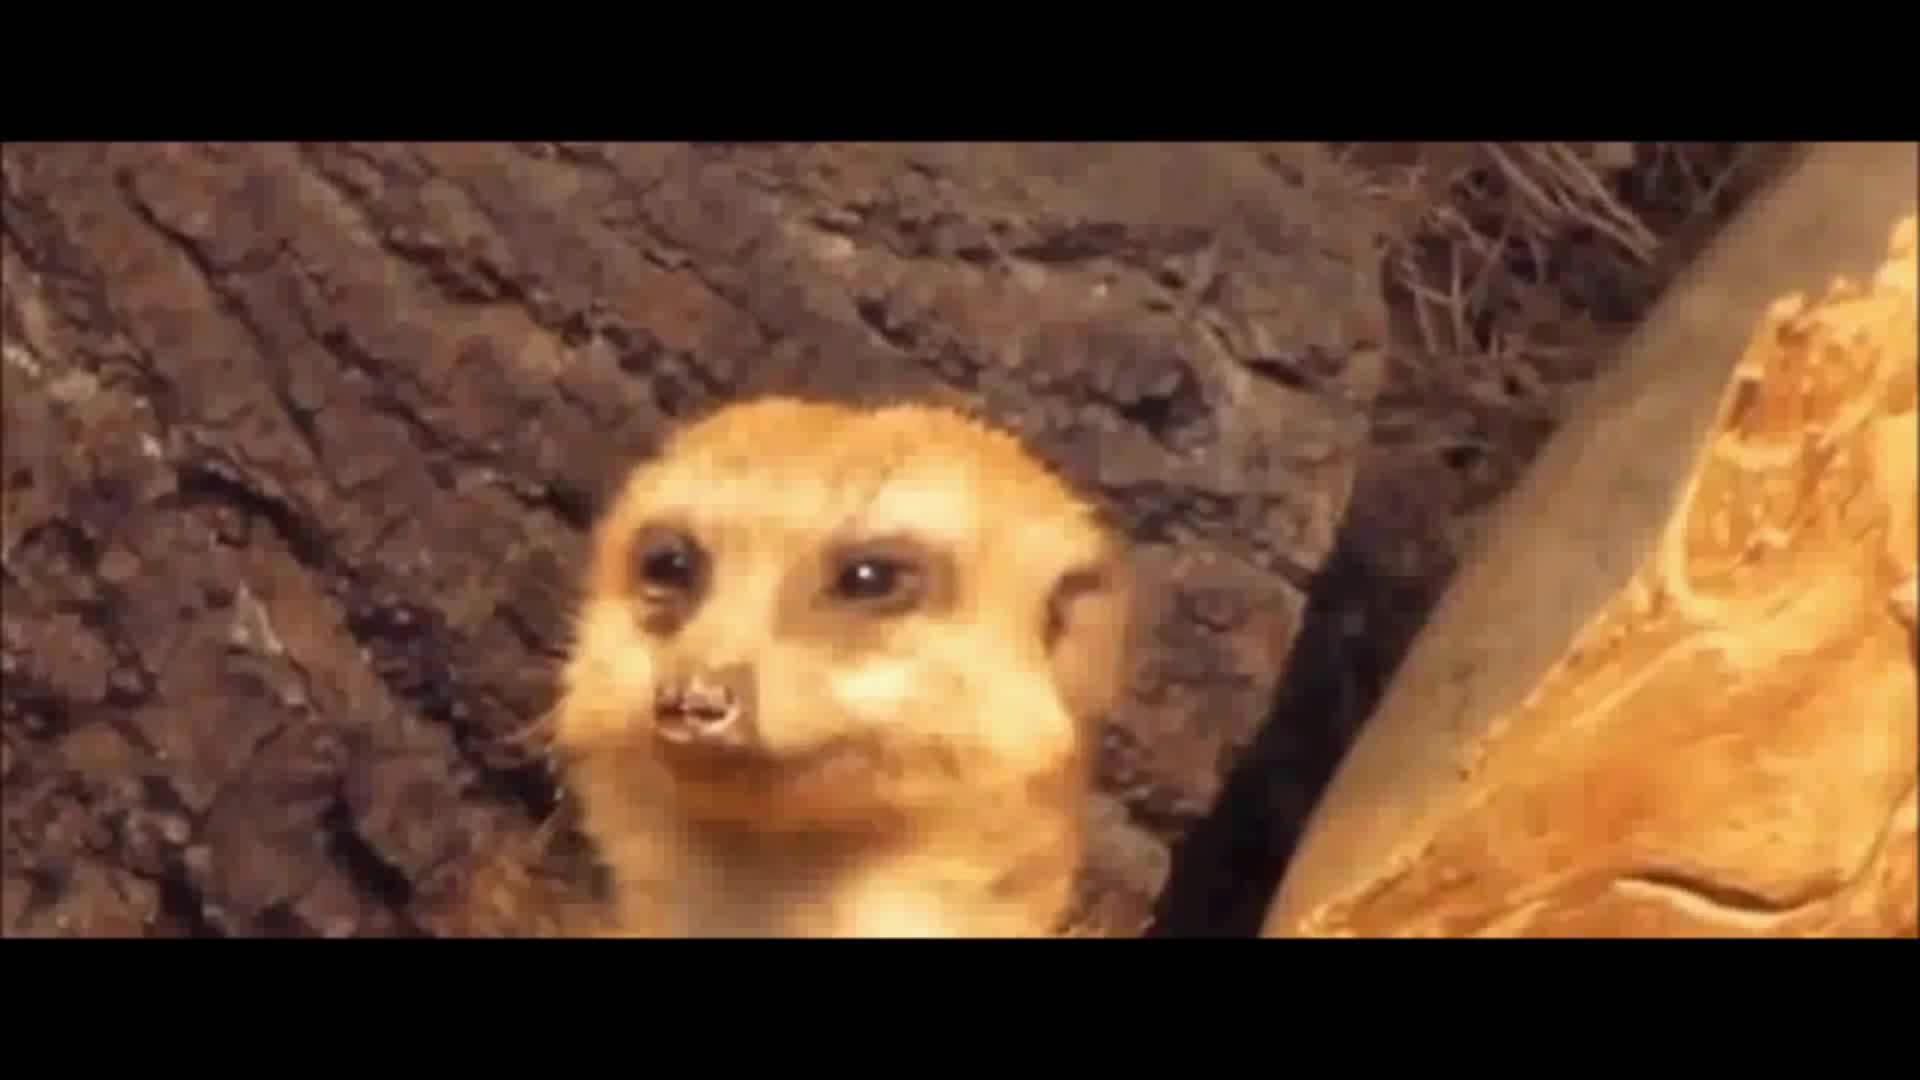 StoppedWorking, asleep, suricat, Meerkat falling asleep GIFs